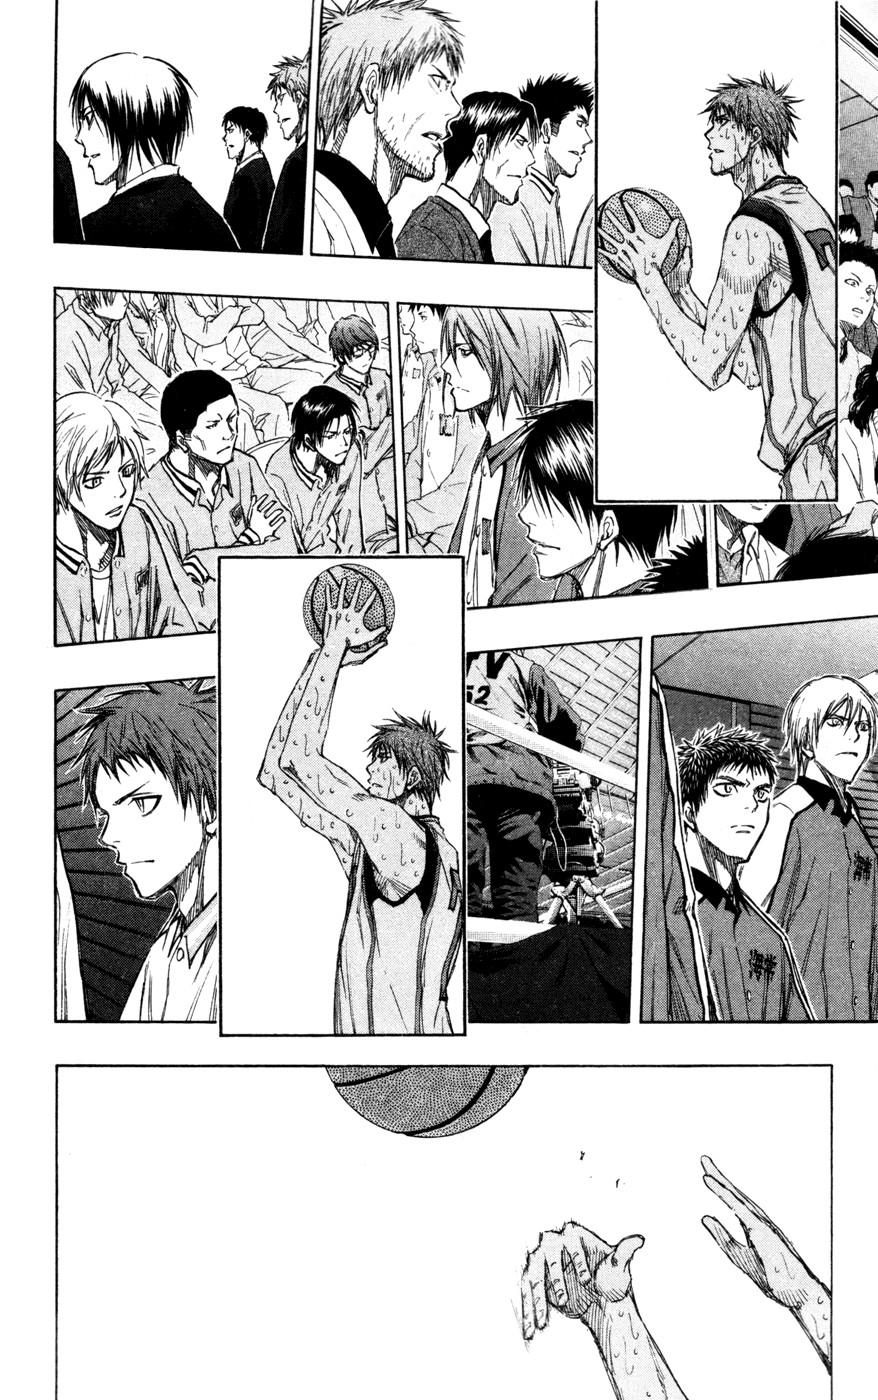 Kuroko no Basket Manga Chapter 138 - Image 10